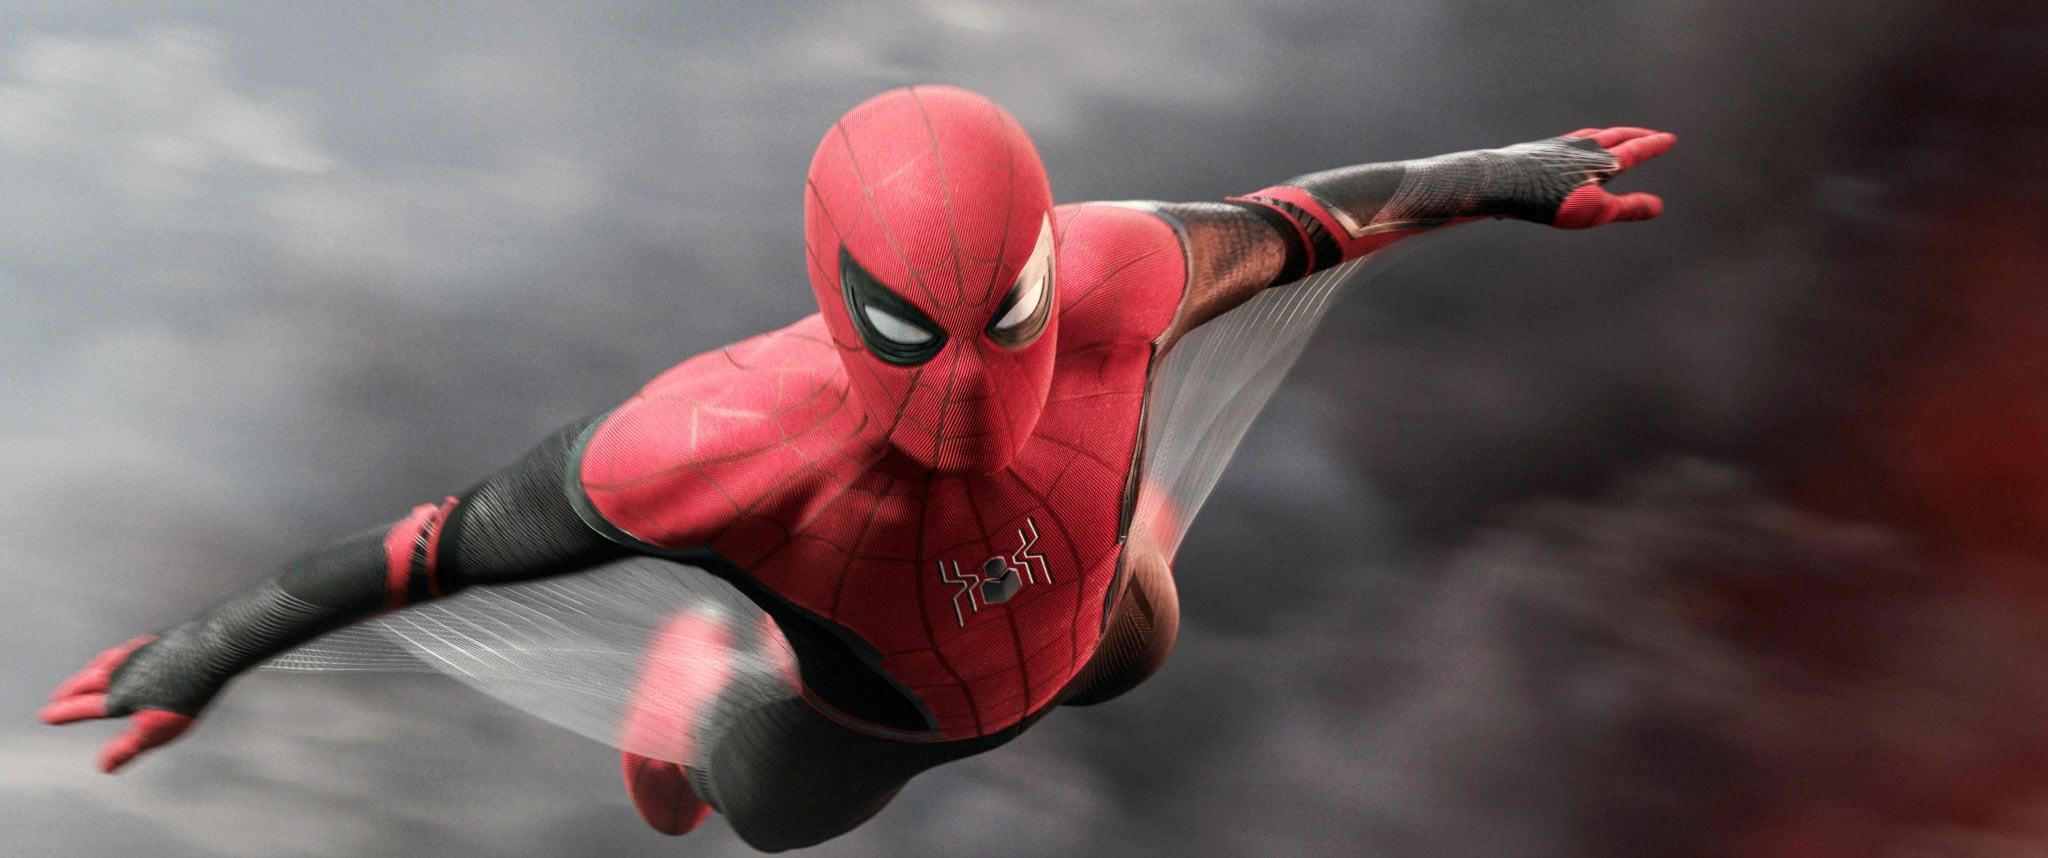 Spider Man Far From postcredits Scene